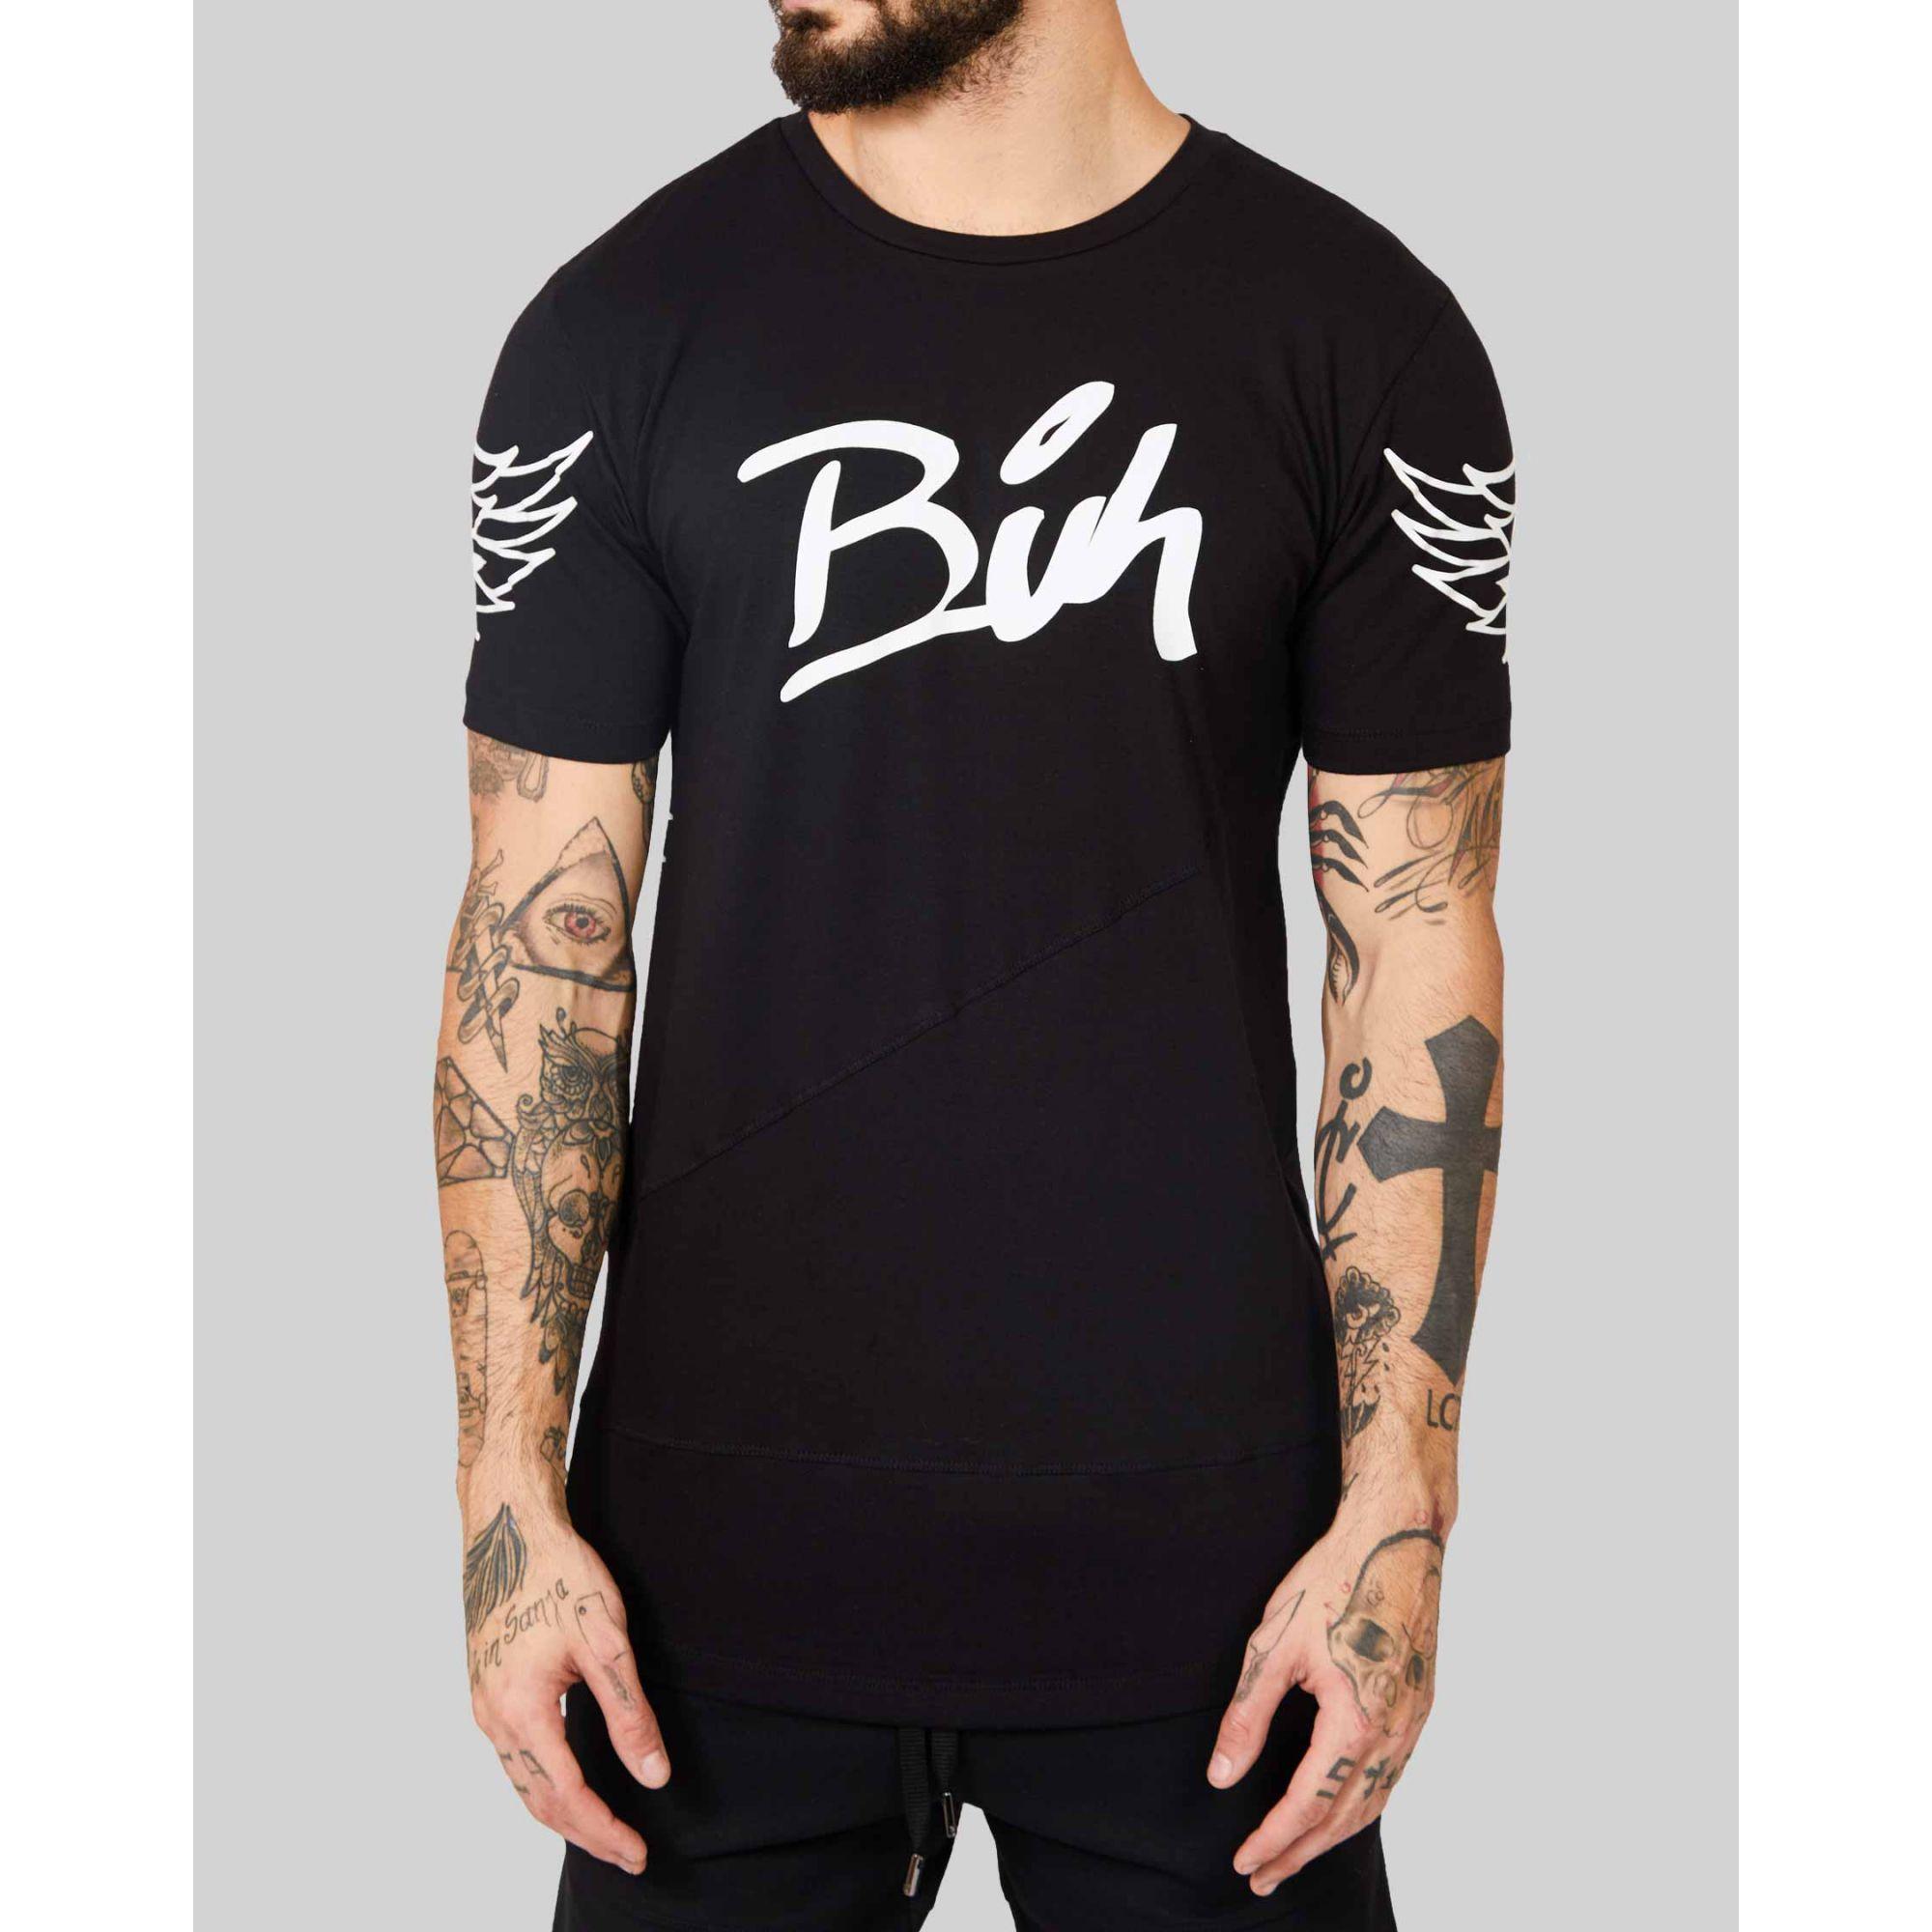 Camiseta Buh Wings Black